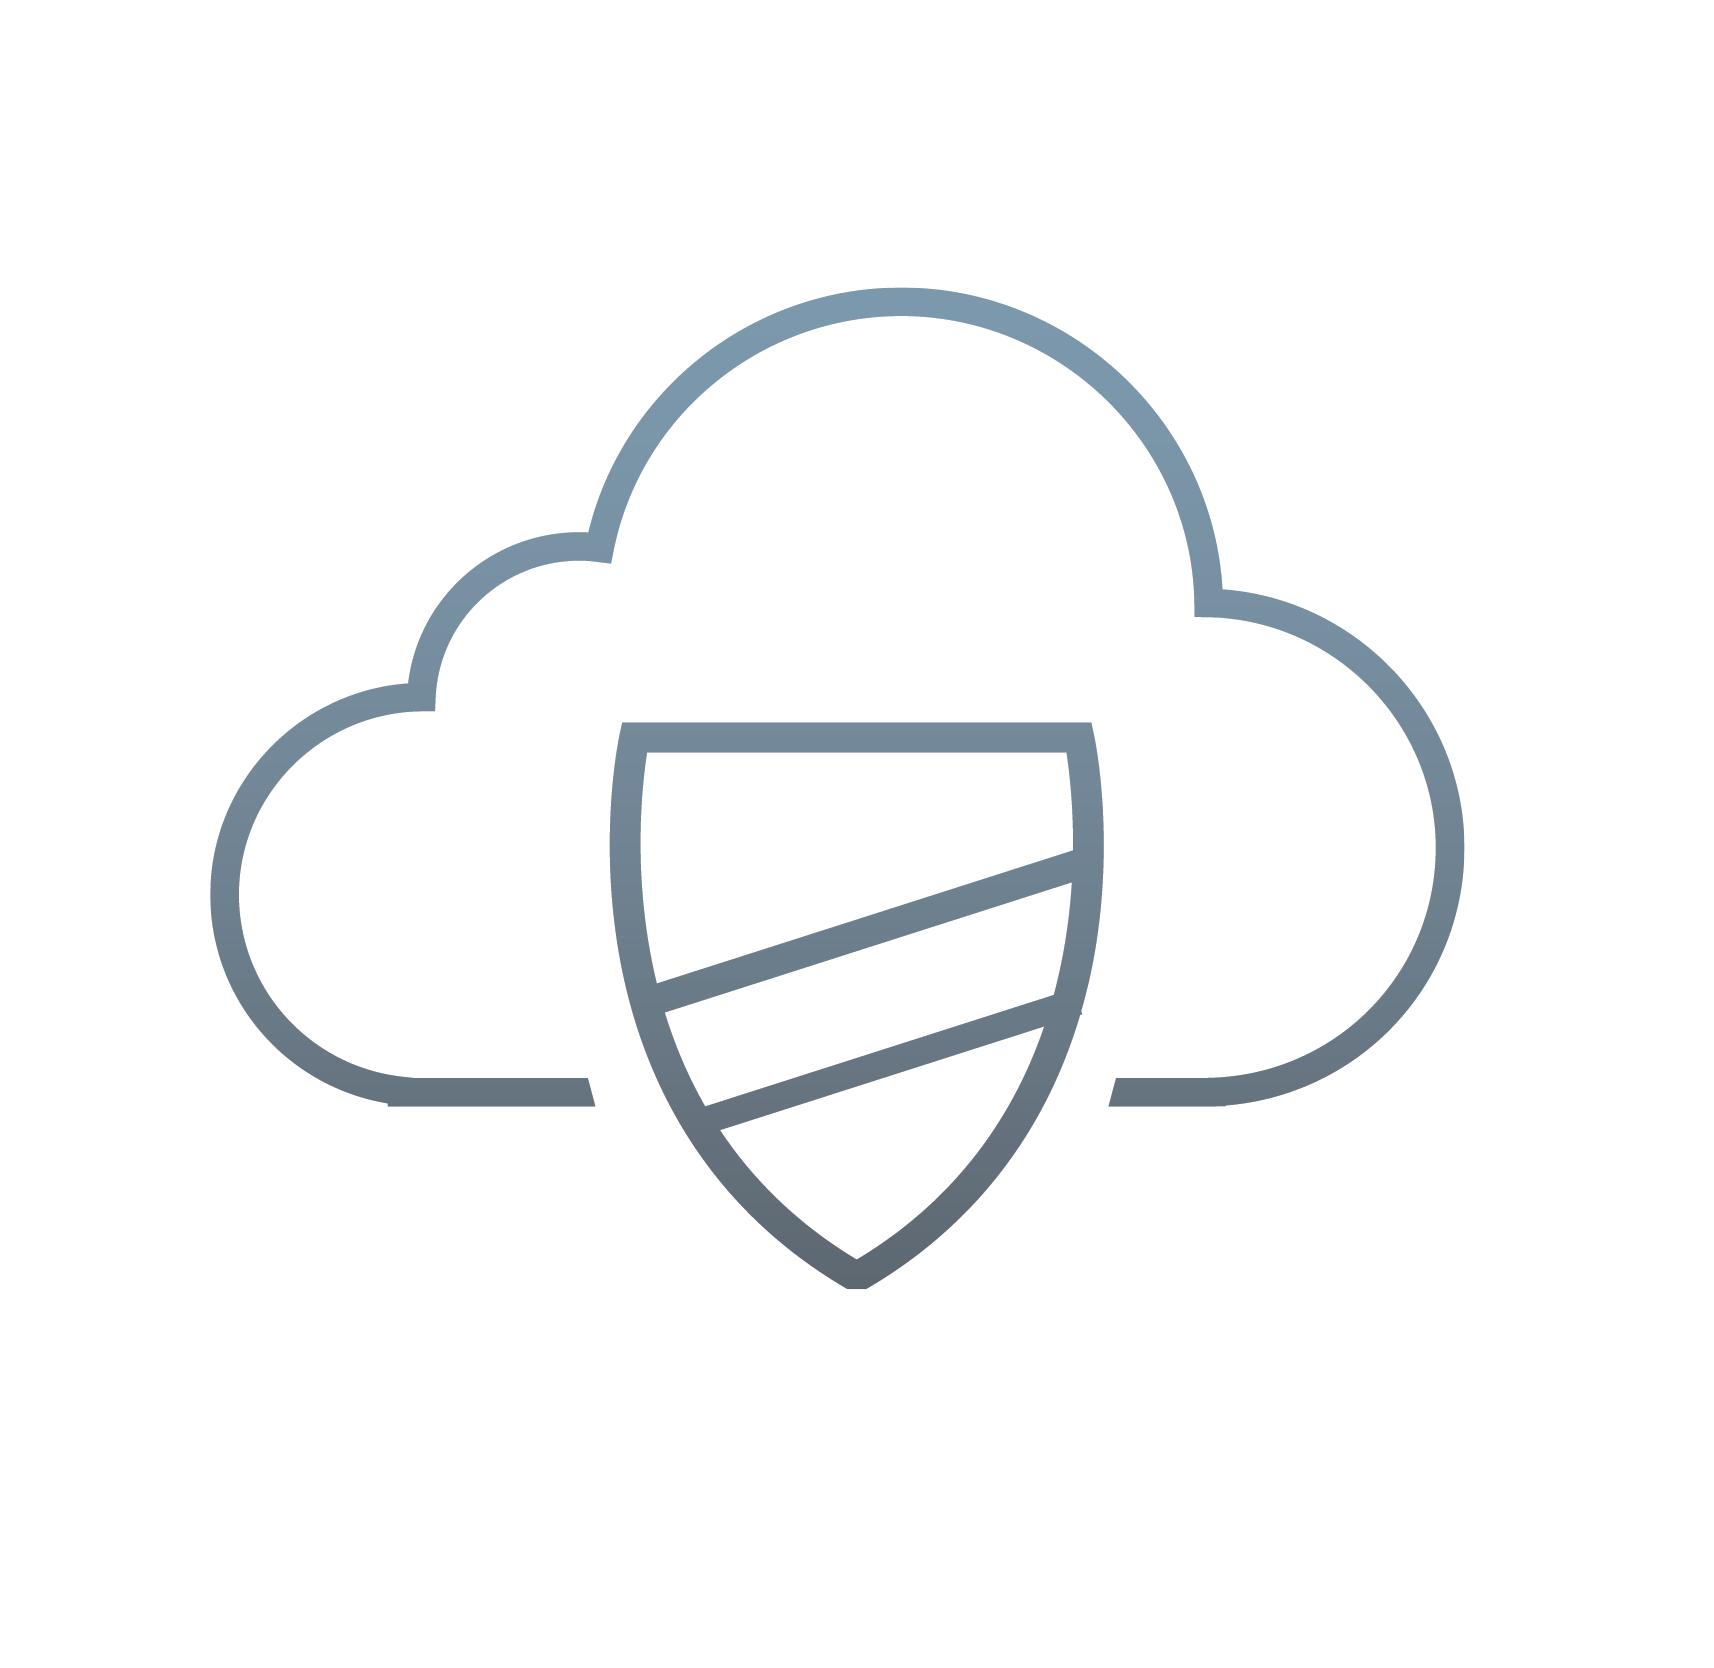 ROVE-icon-shield 1.png